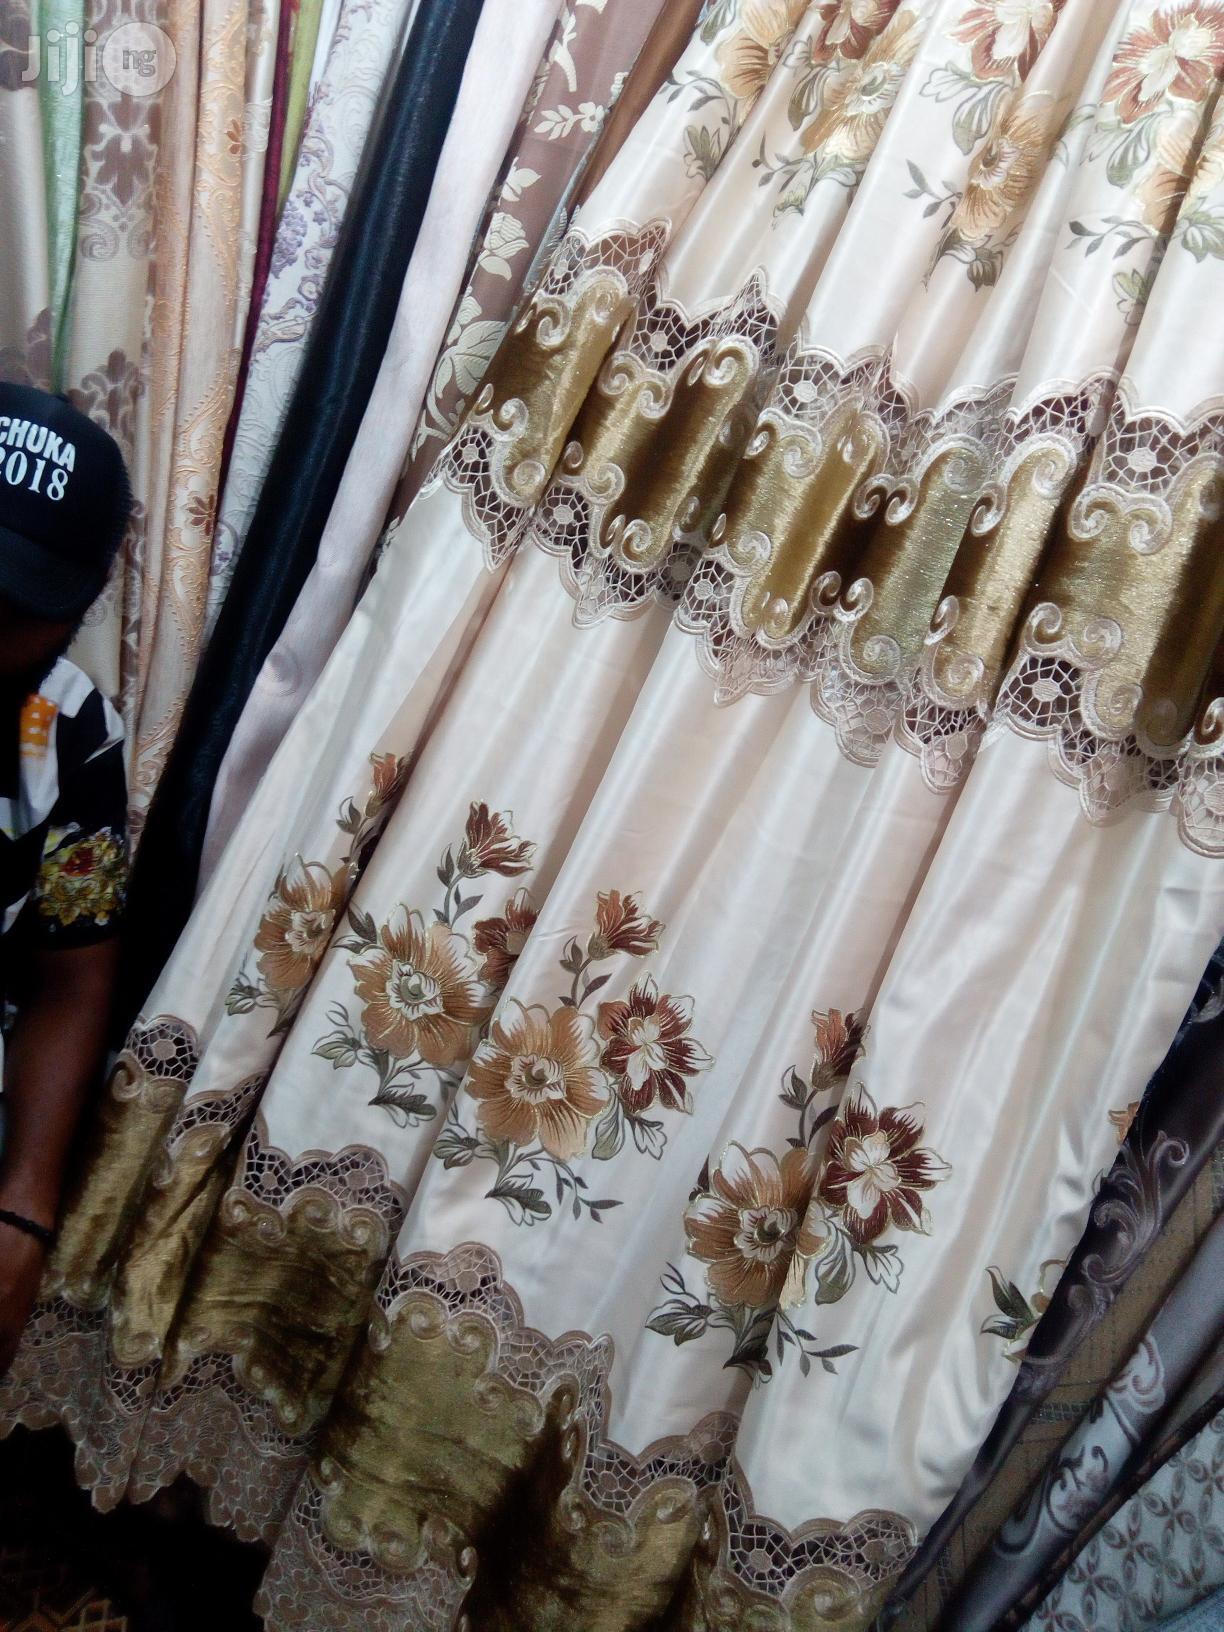 Curtain Interiors | Home Accessories for sale in Abakaliki, Ebonyi State, Nigeria